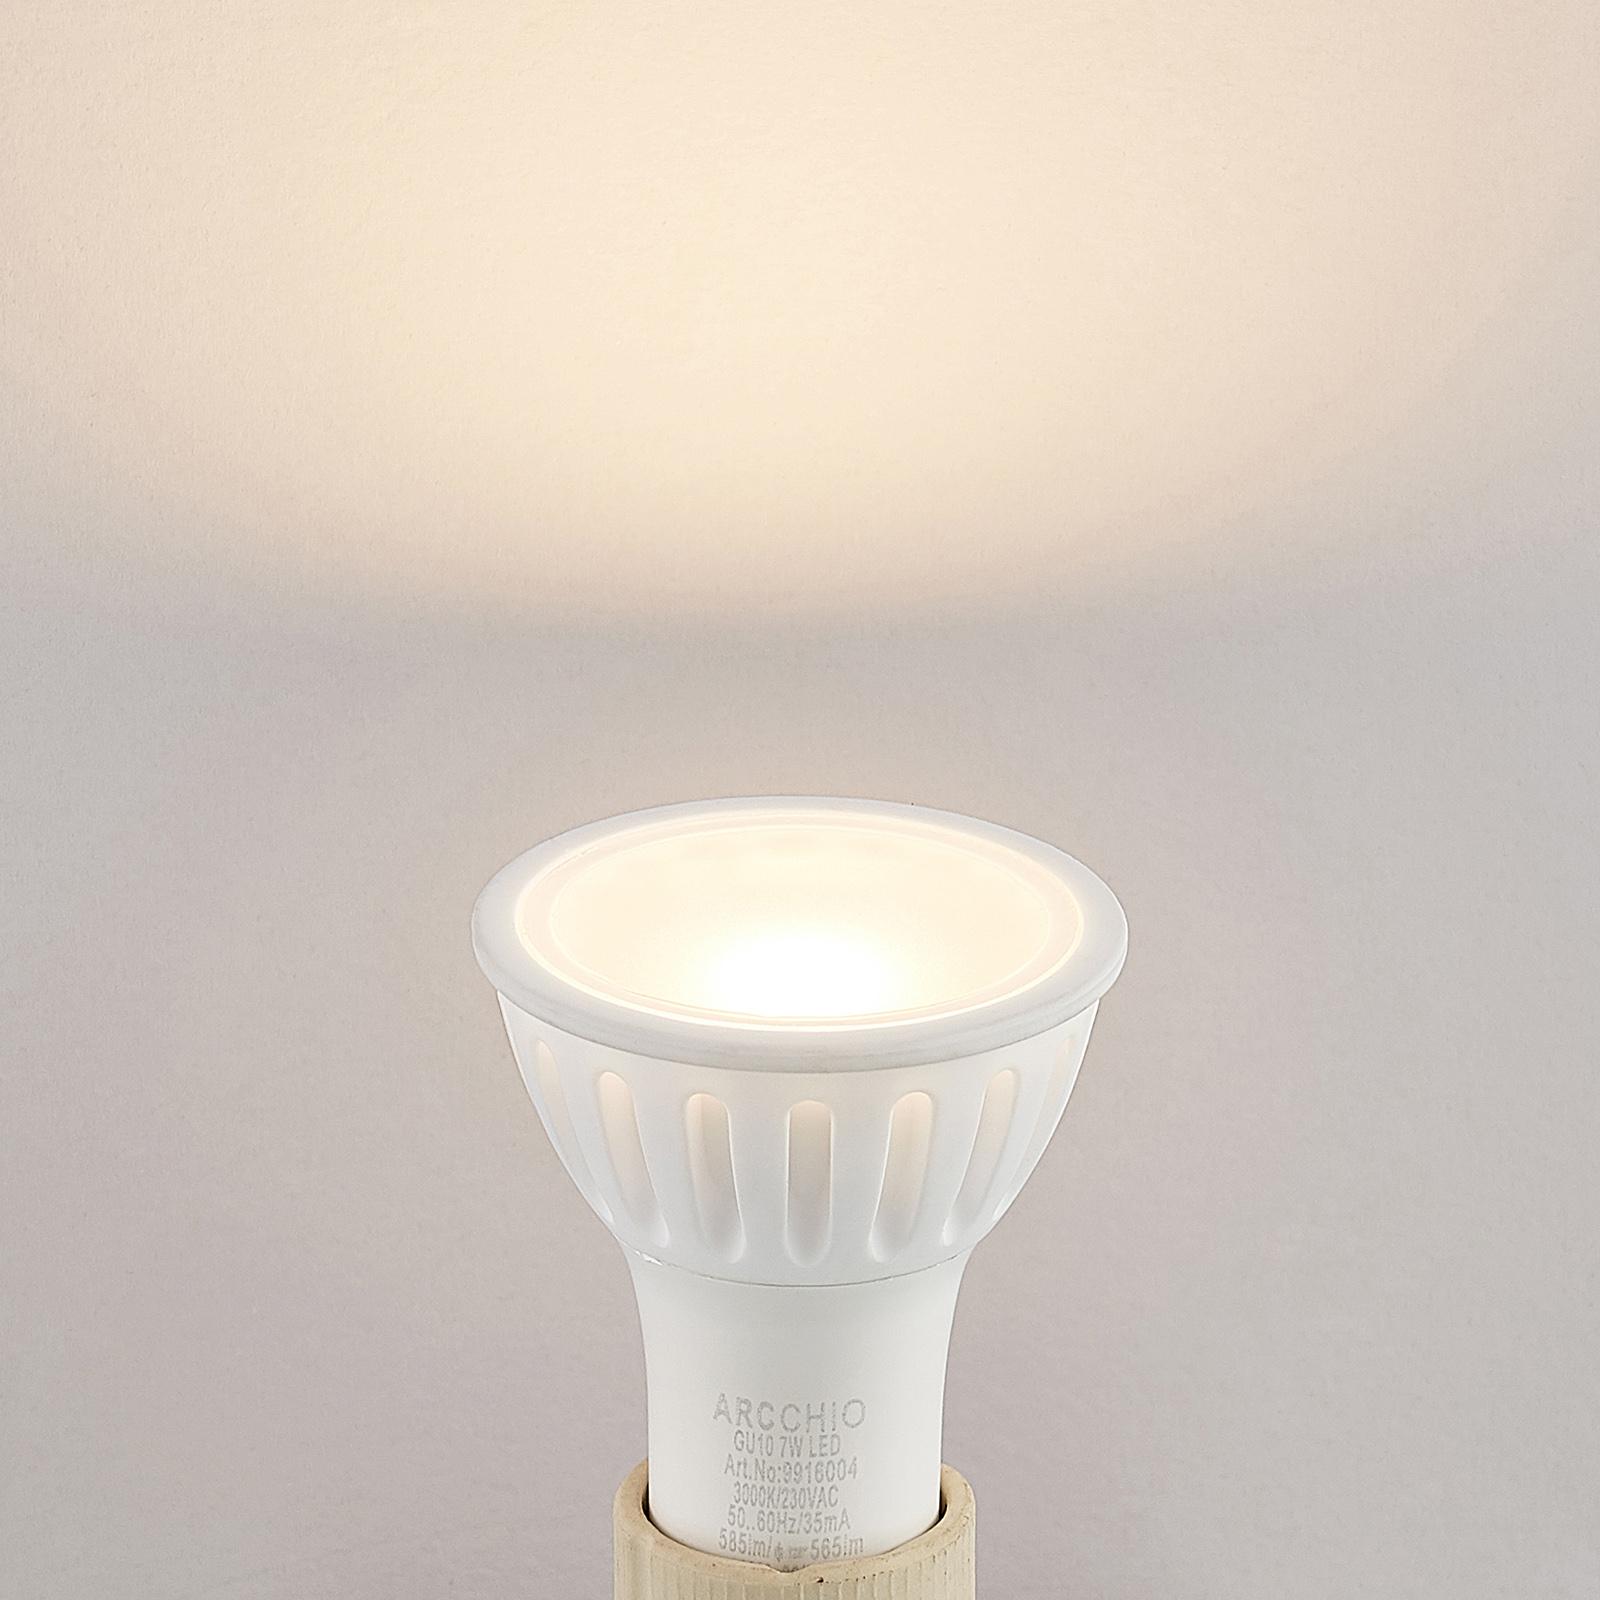 Arcchio LED reflector GU10 100° 7W 3.000K dimbaar